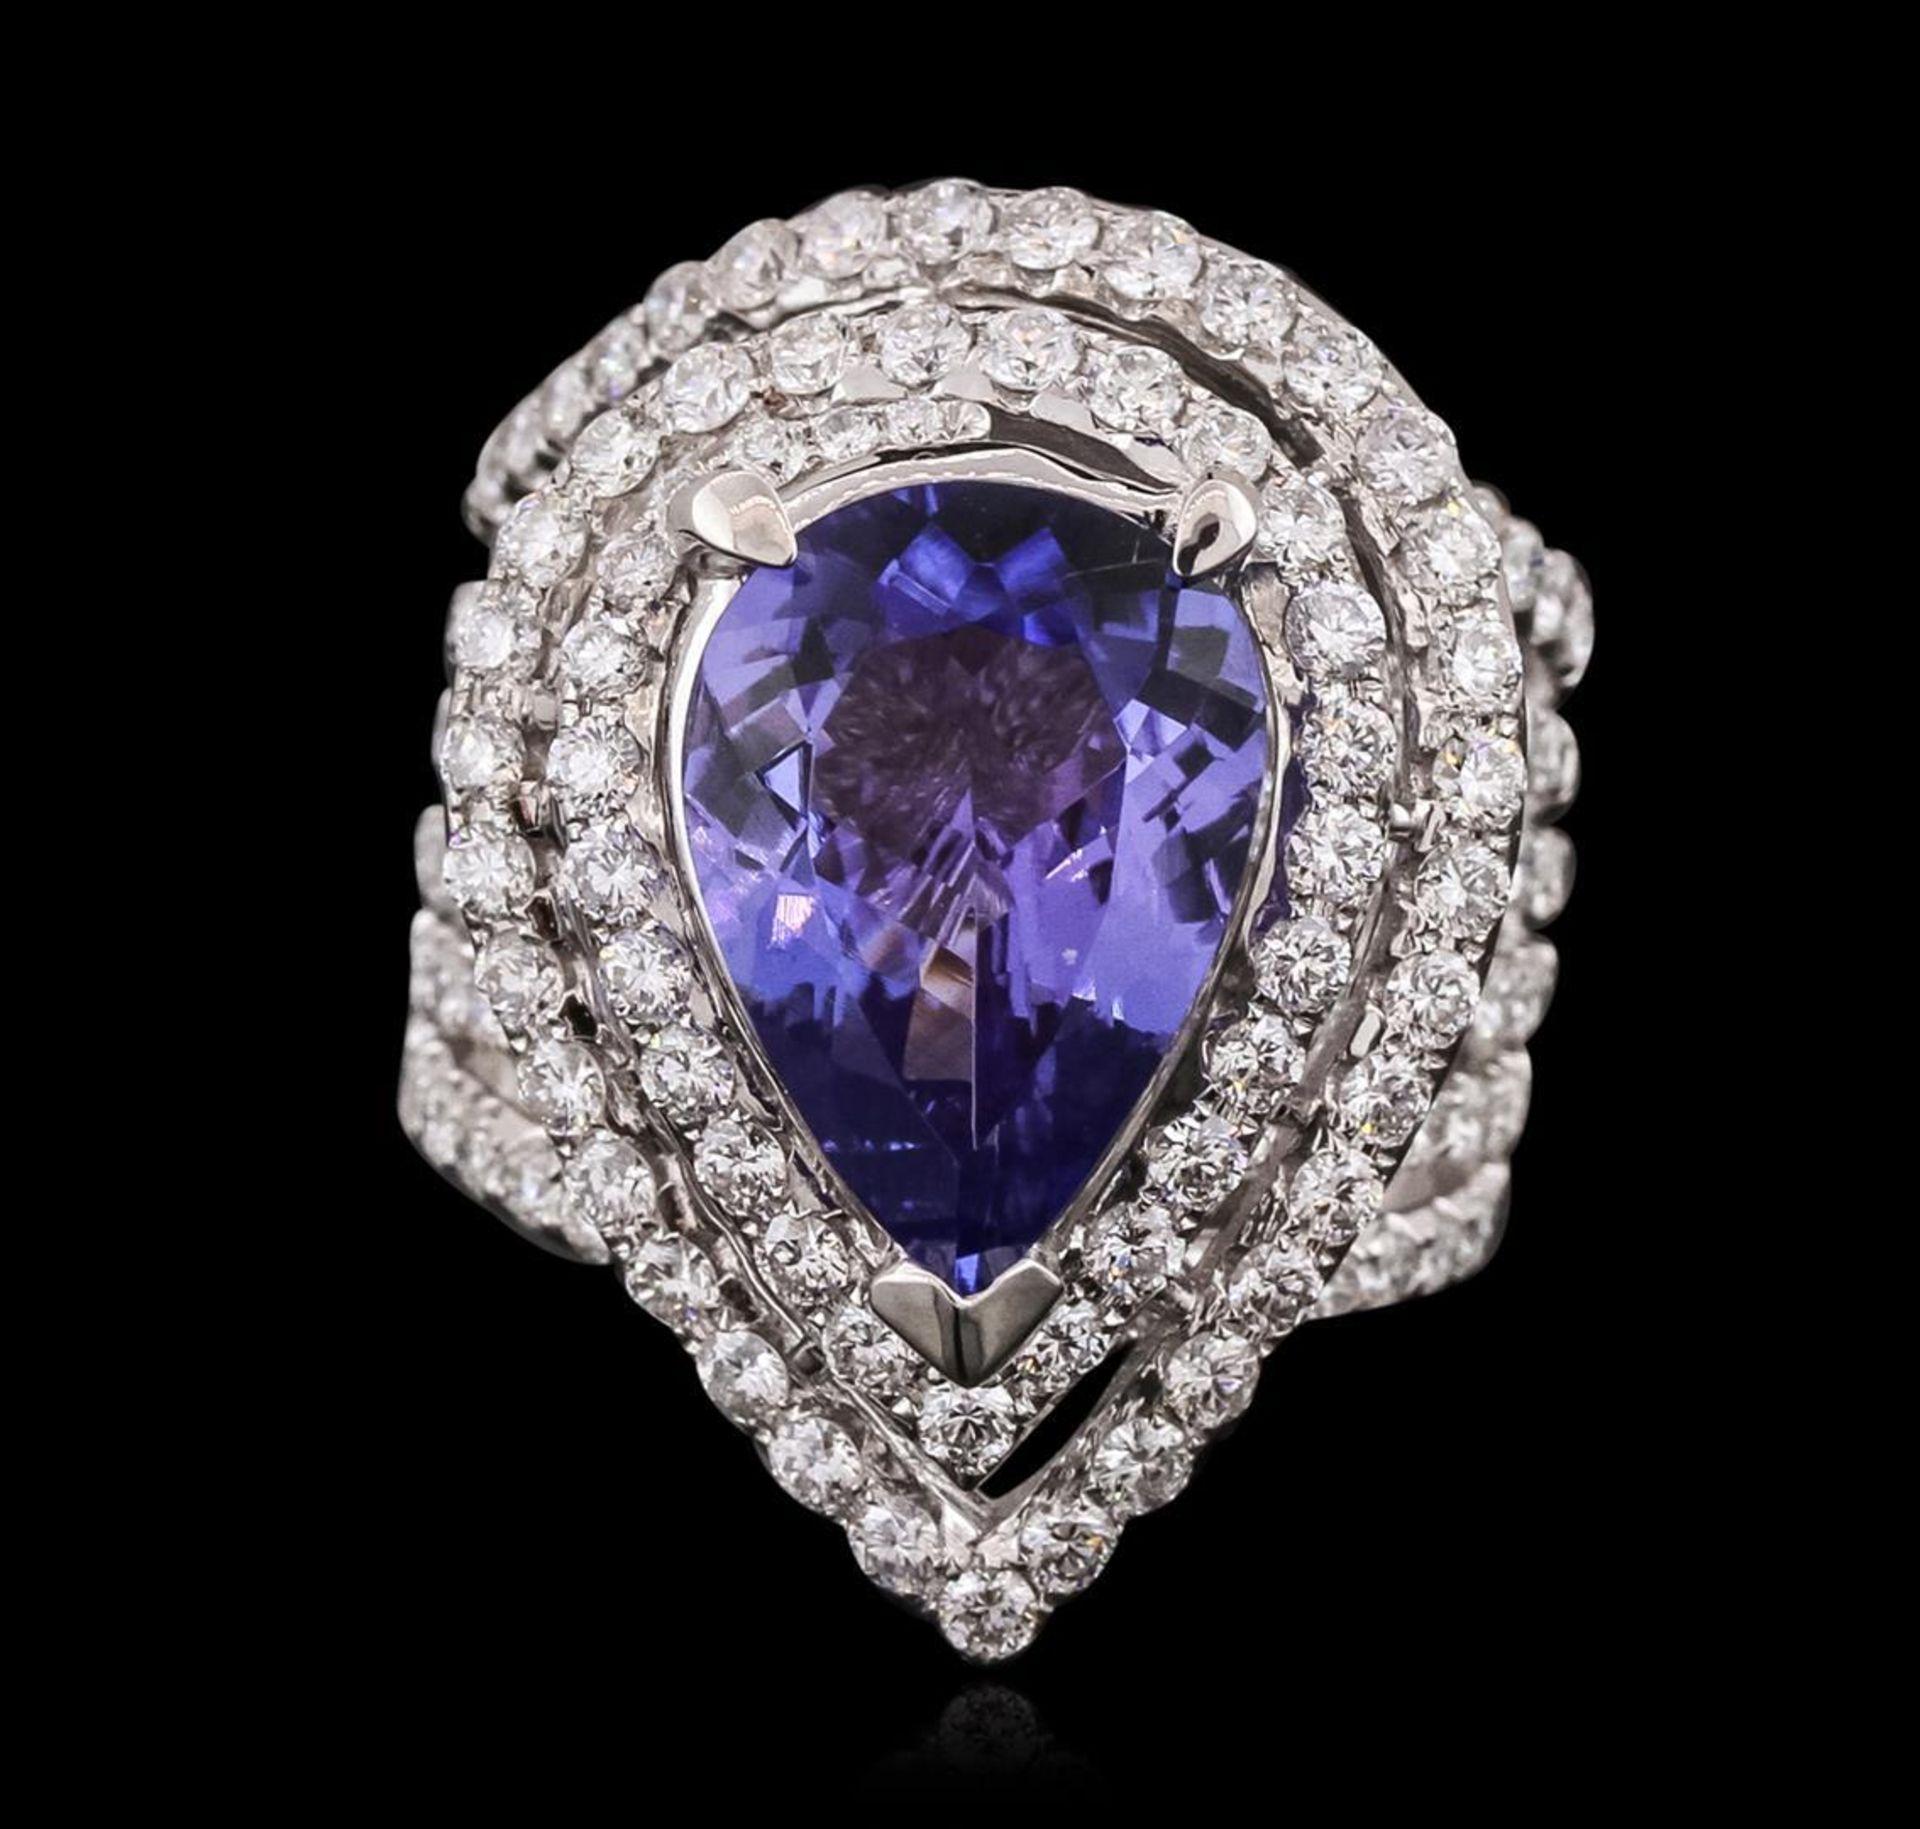 18KT White Gold 6.53 ctw Tanzanite and Diamond Ring - Image 2 of 3